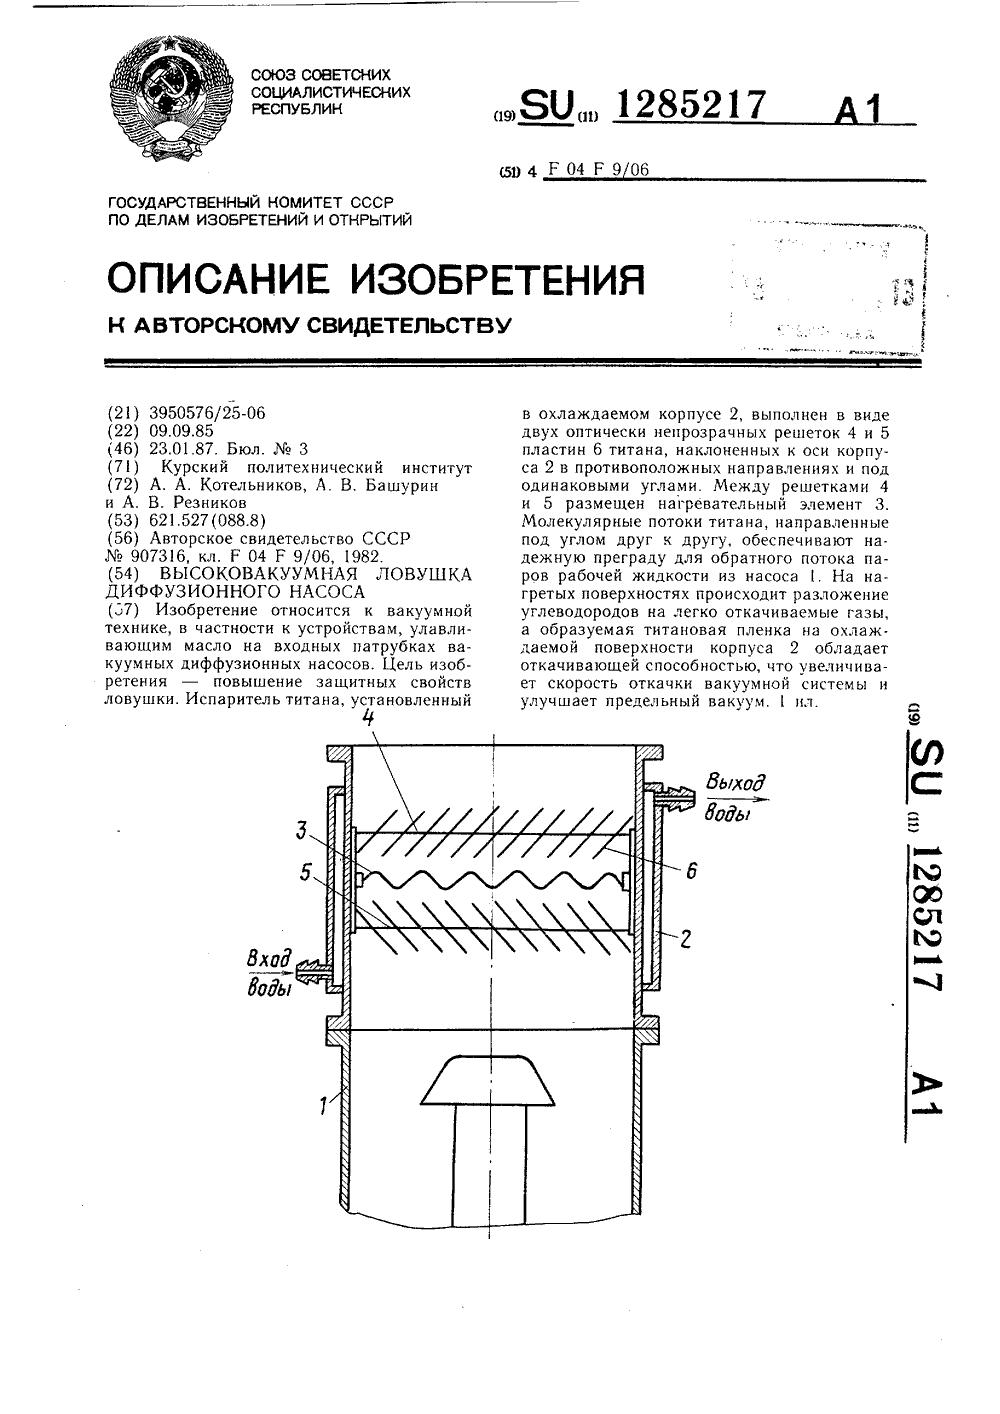 схема диффузионного парамаслянного насоса